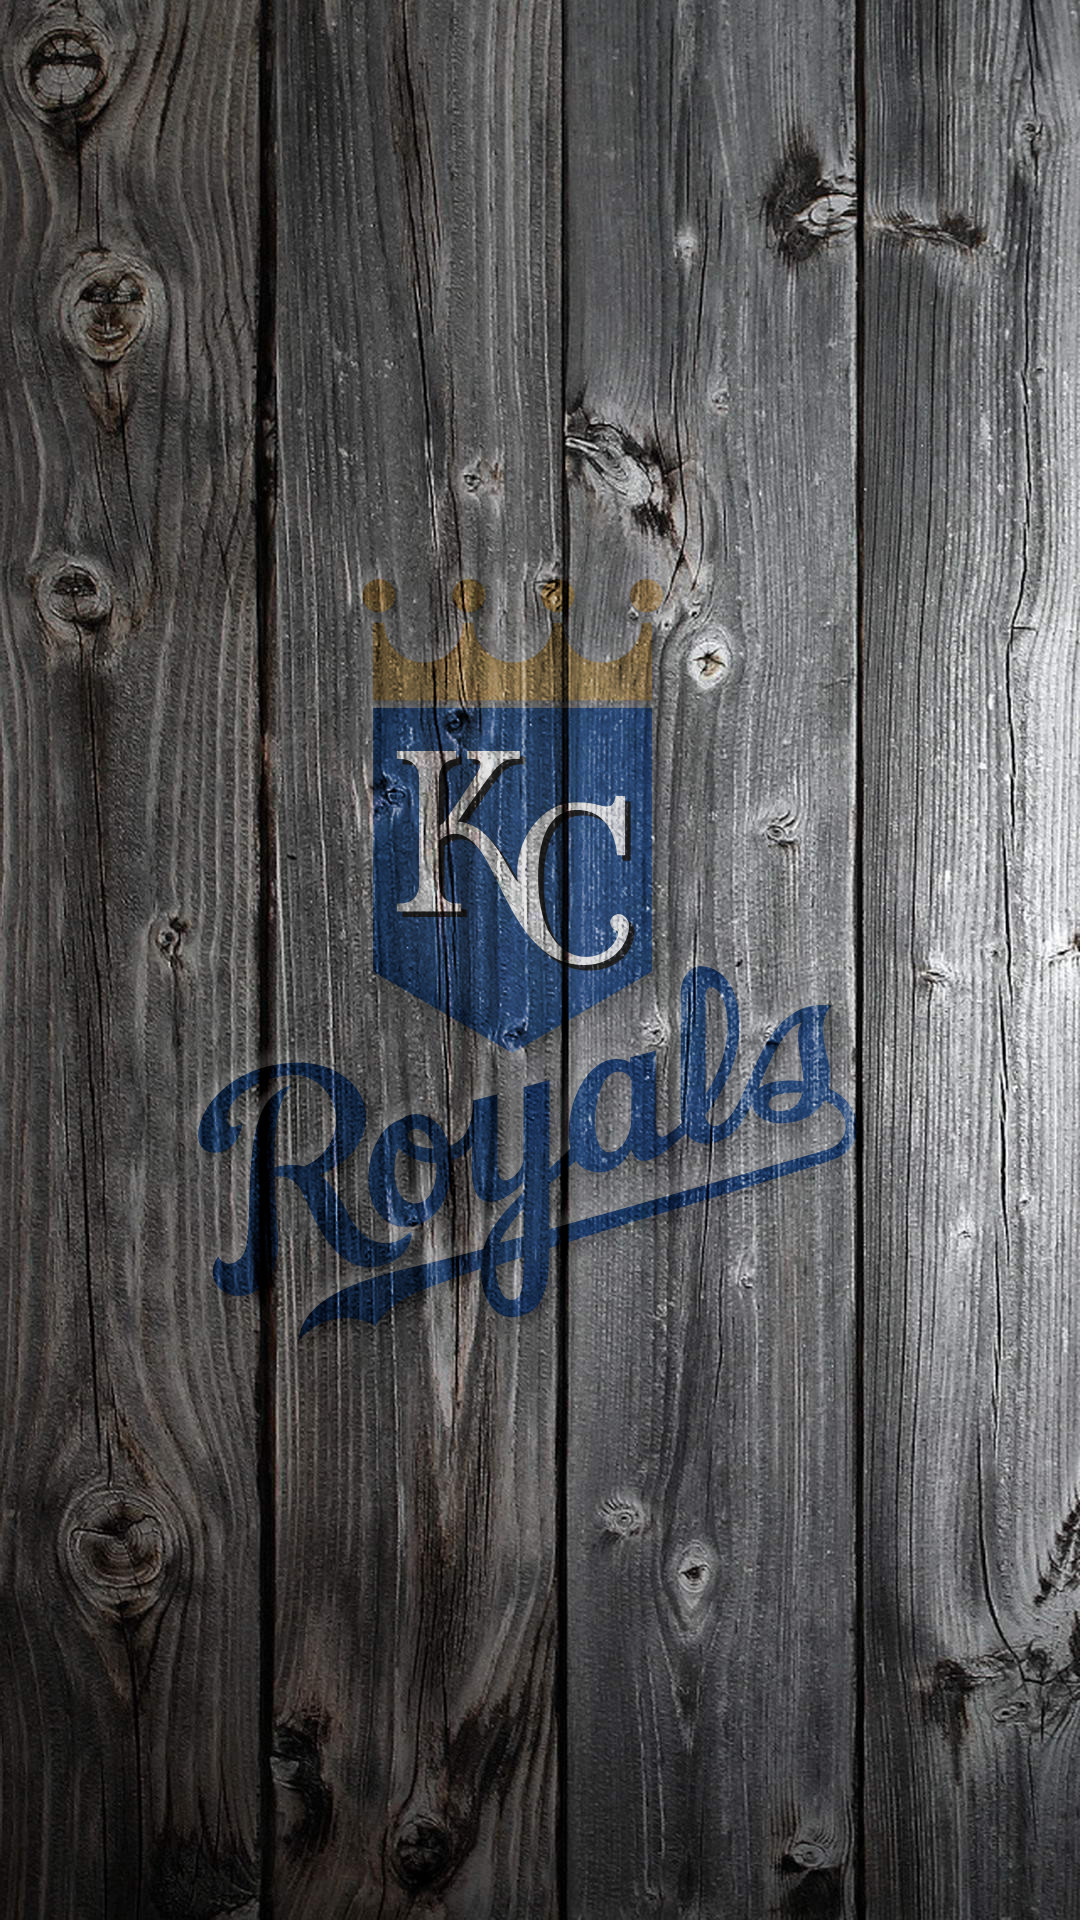 Kc Royals World Series Champions